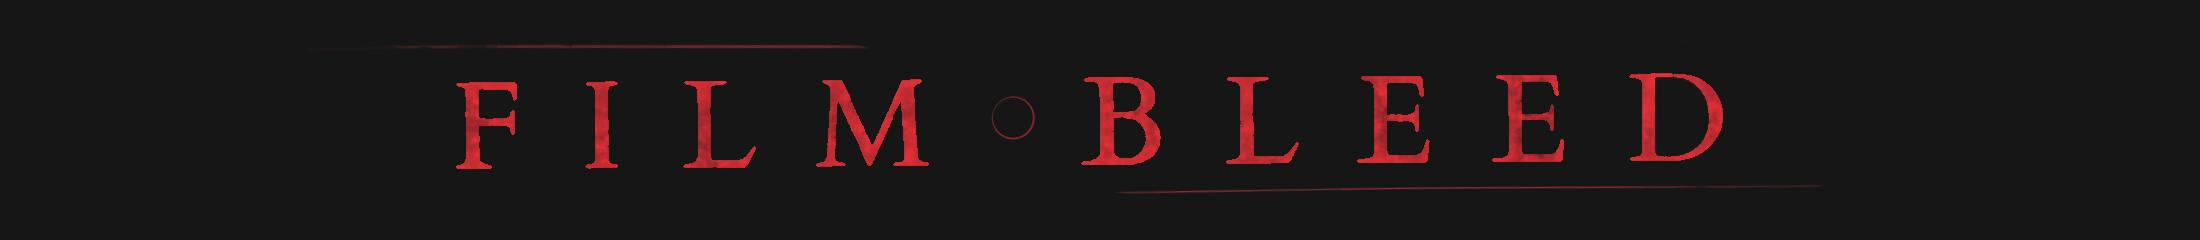 Film Bleed